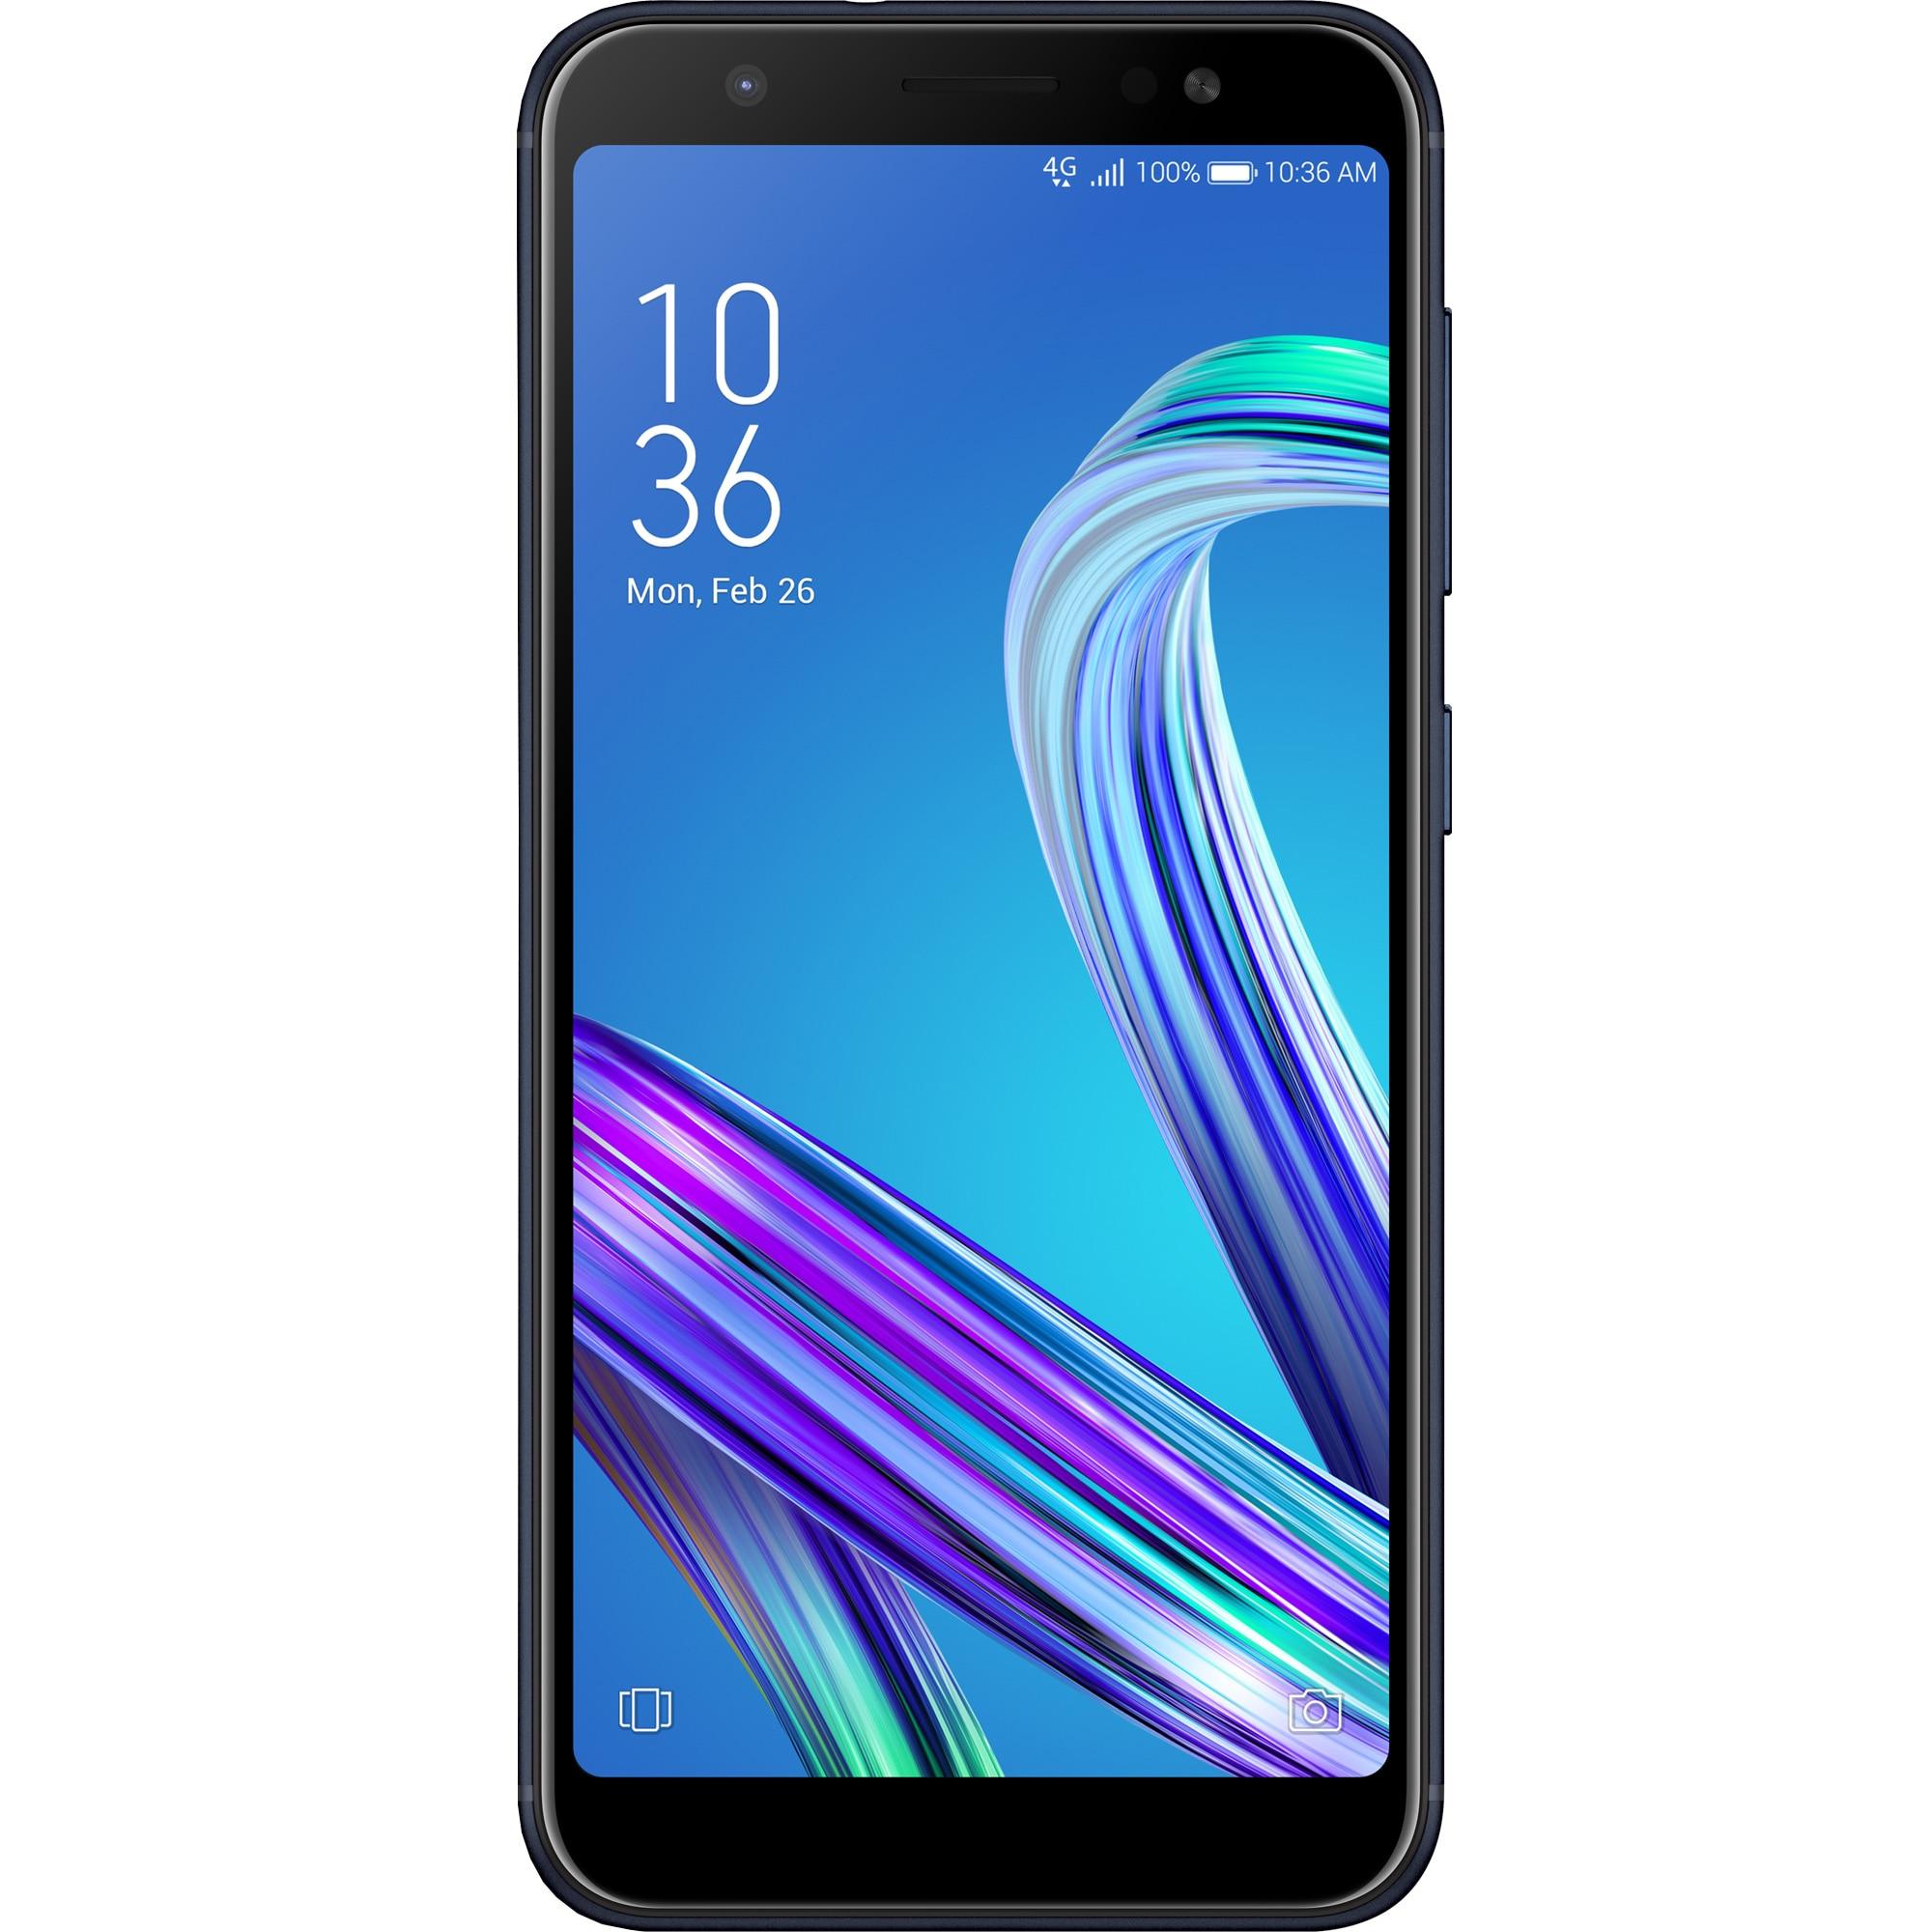 Fotografie Telefon mobil Asus Zenfone Max M1 ZB555KL, Dual SIM, 32GB, 4G, Deepsea Black